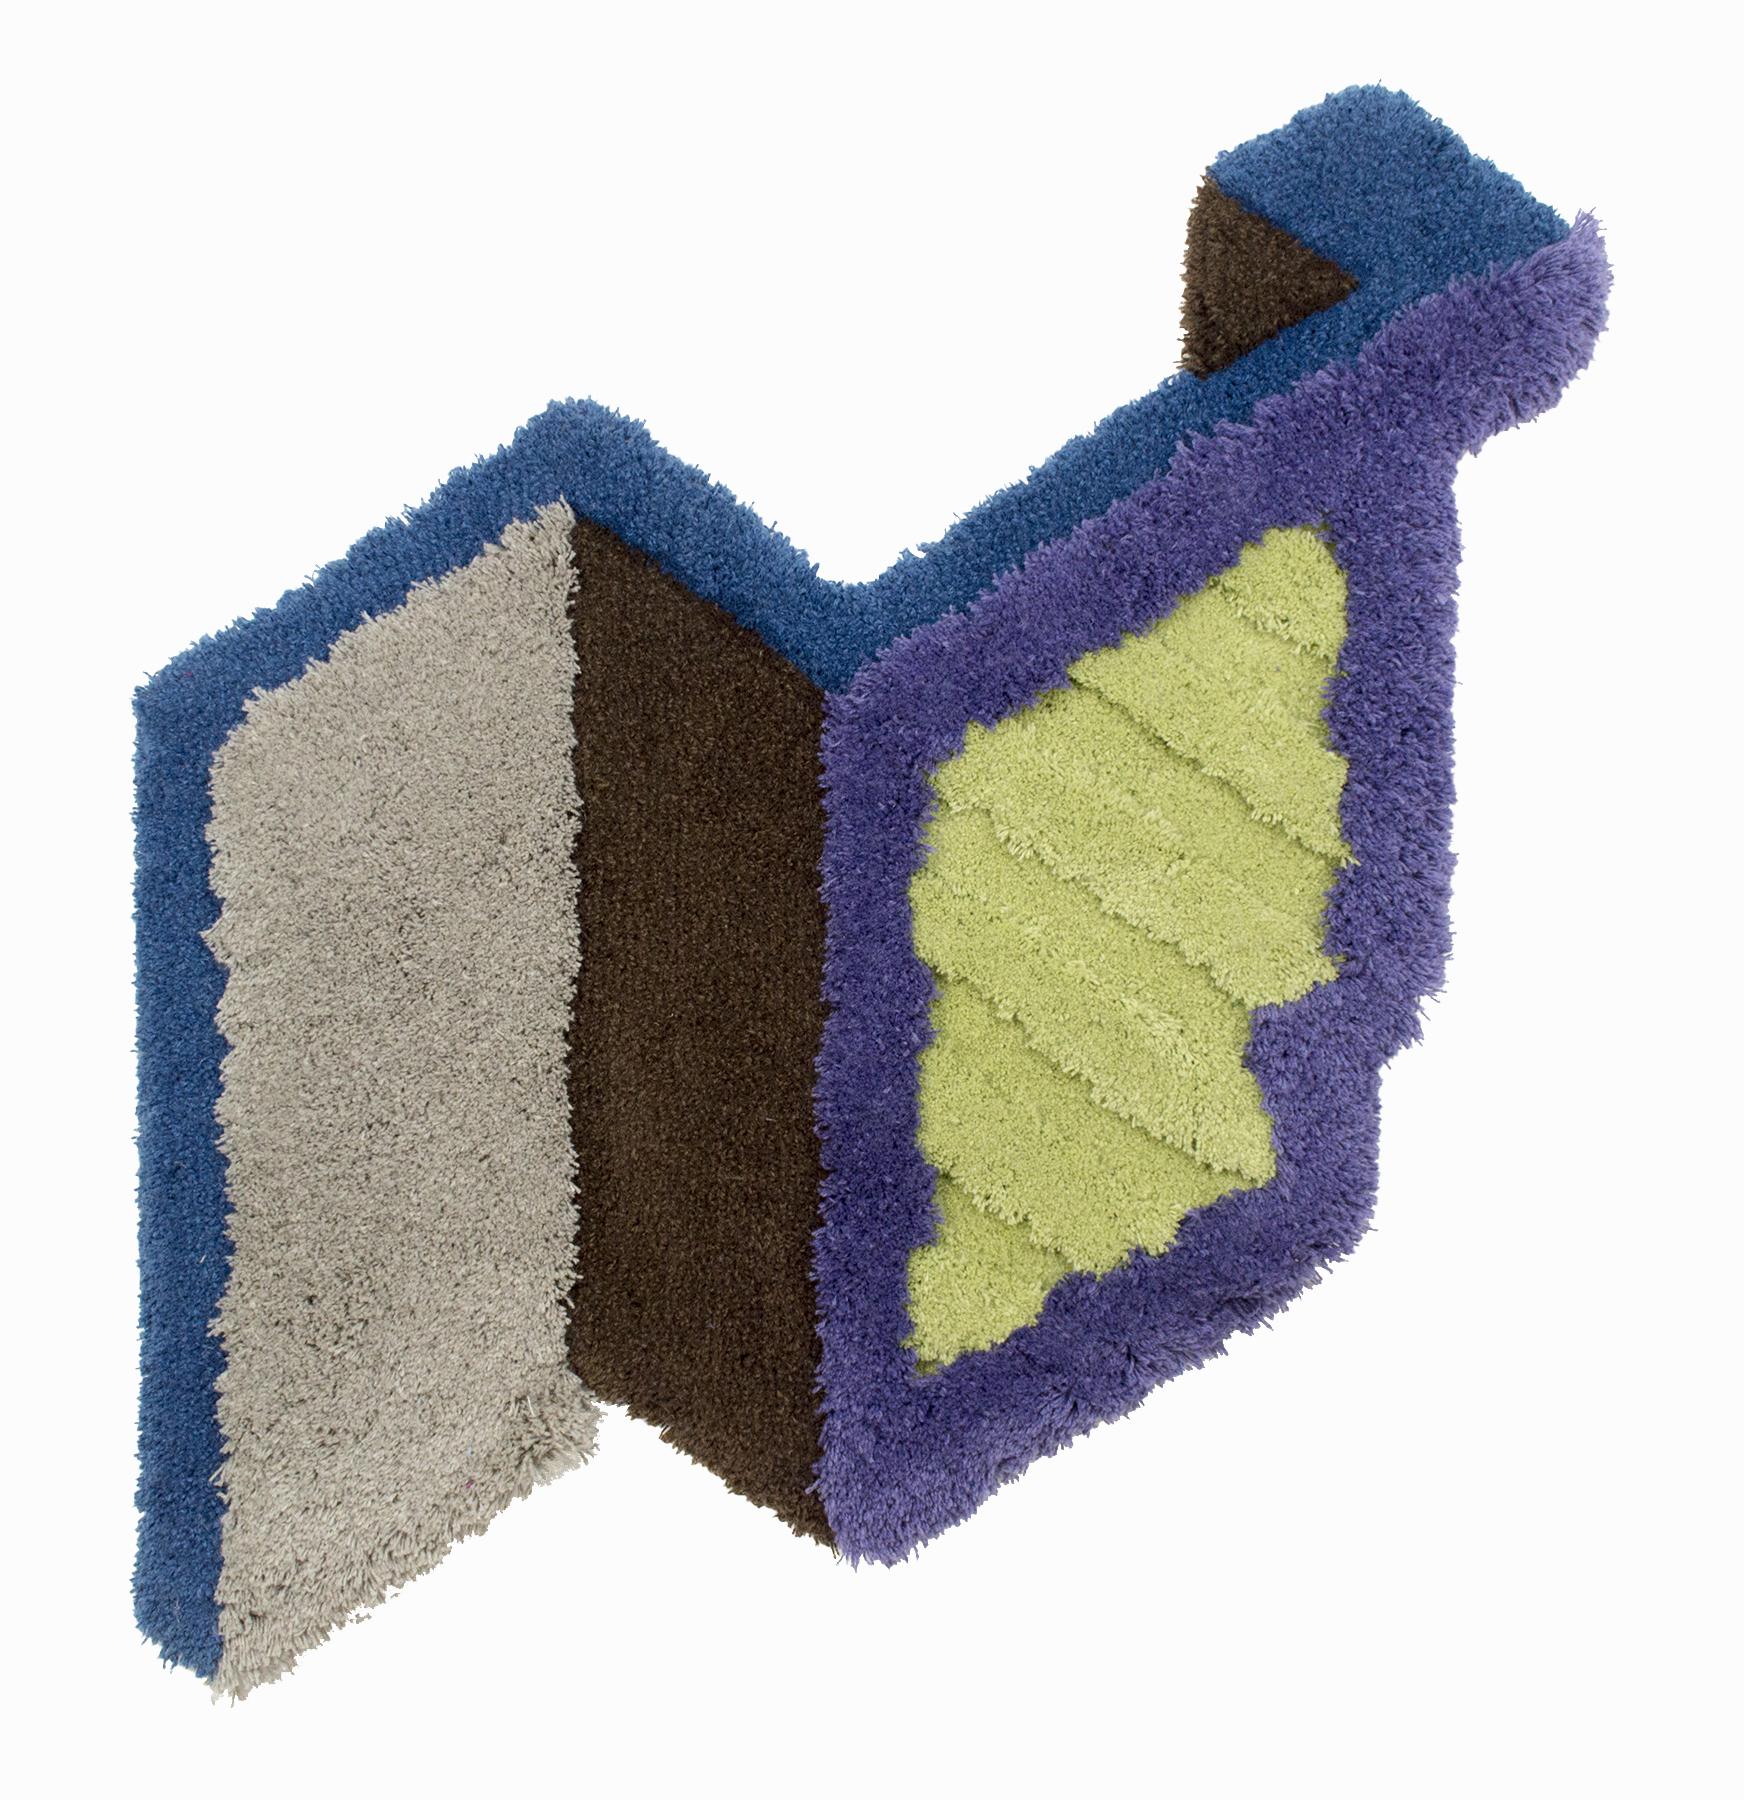 Soffit, 48 x 43 inches / 121.9 x 109.2 cm, wool yarn on wood panel, 2019